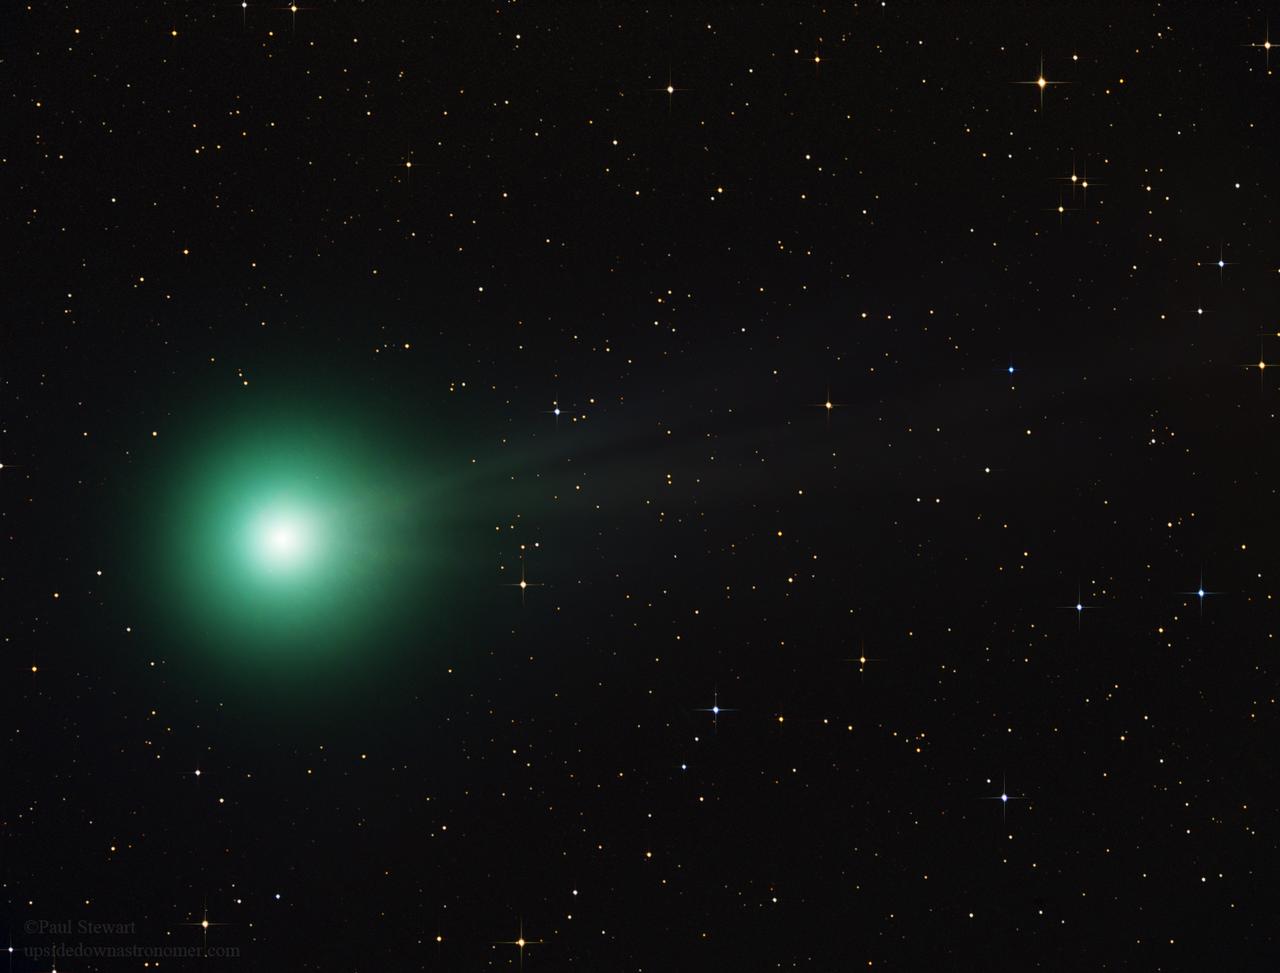 Comet lovejoy green